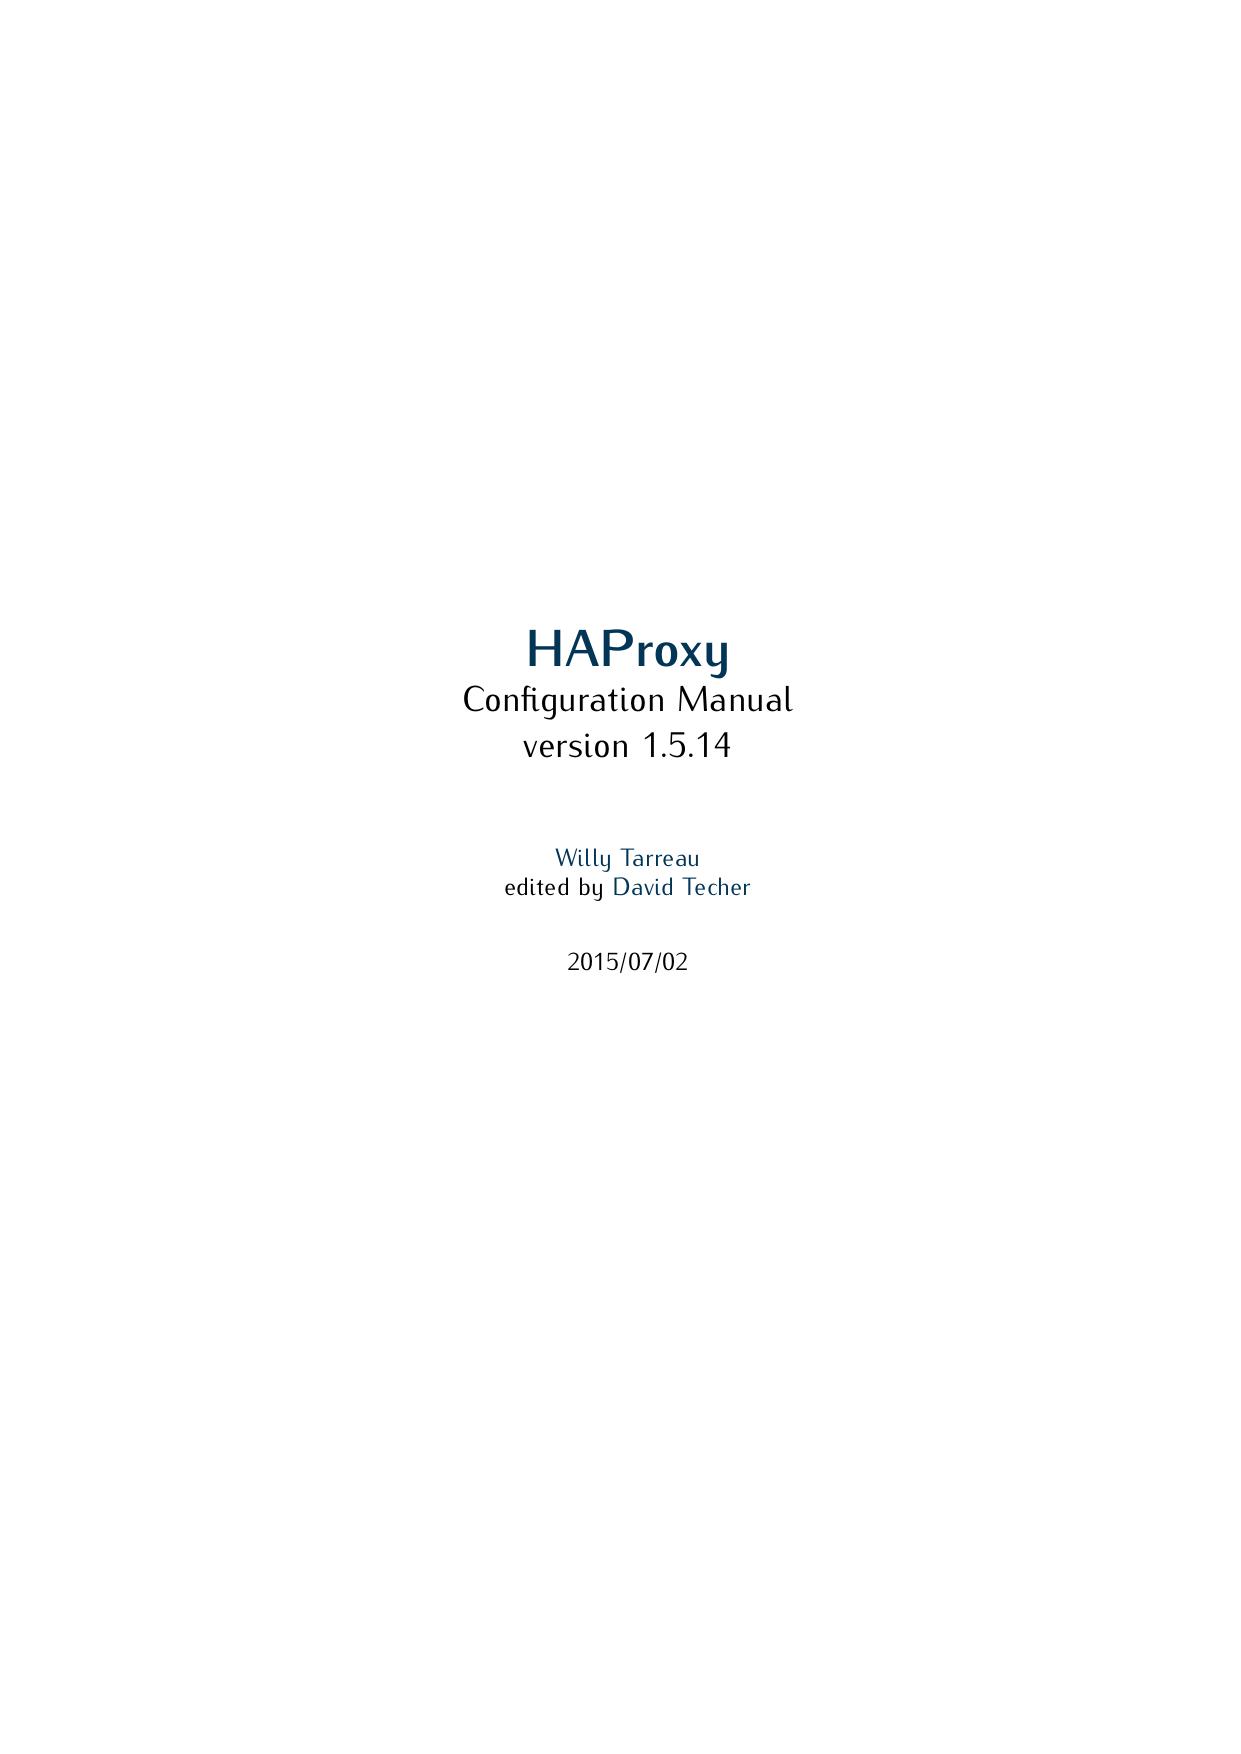 HAProxy Configuration Manual v1 5 14 | manualzz com